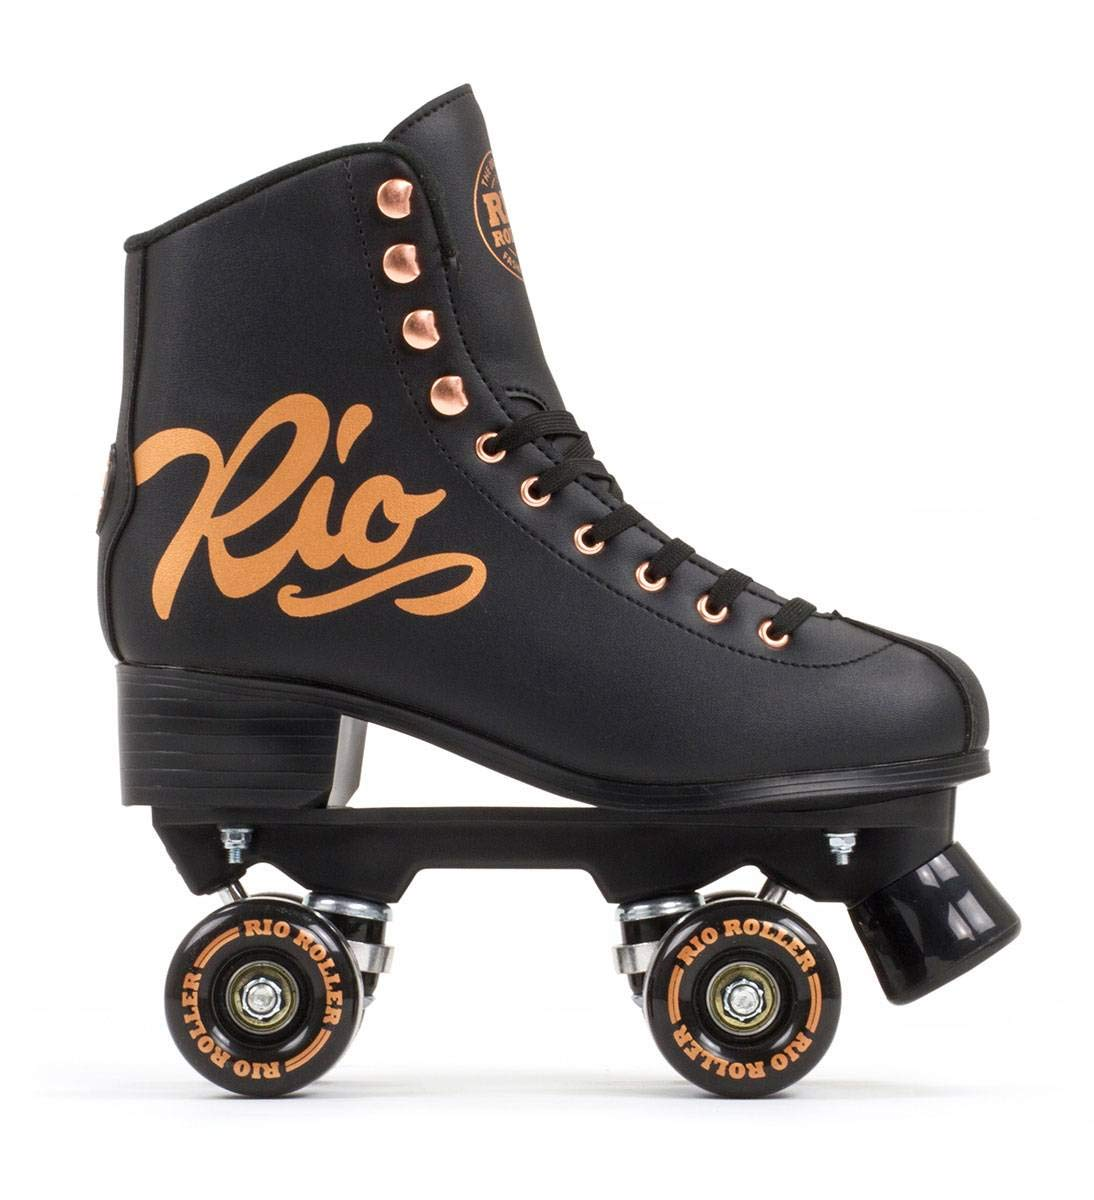 Rio Roller Rosa Rollschuhe schwarz-Goldfarben Damen Damen Damen B07NQLNRPZ Rollschuhe Feinbearbeitung 5f13b3